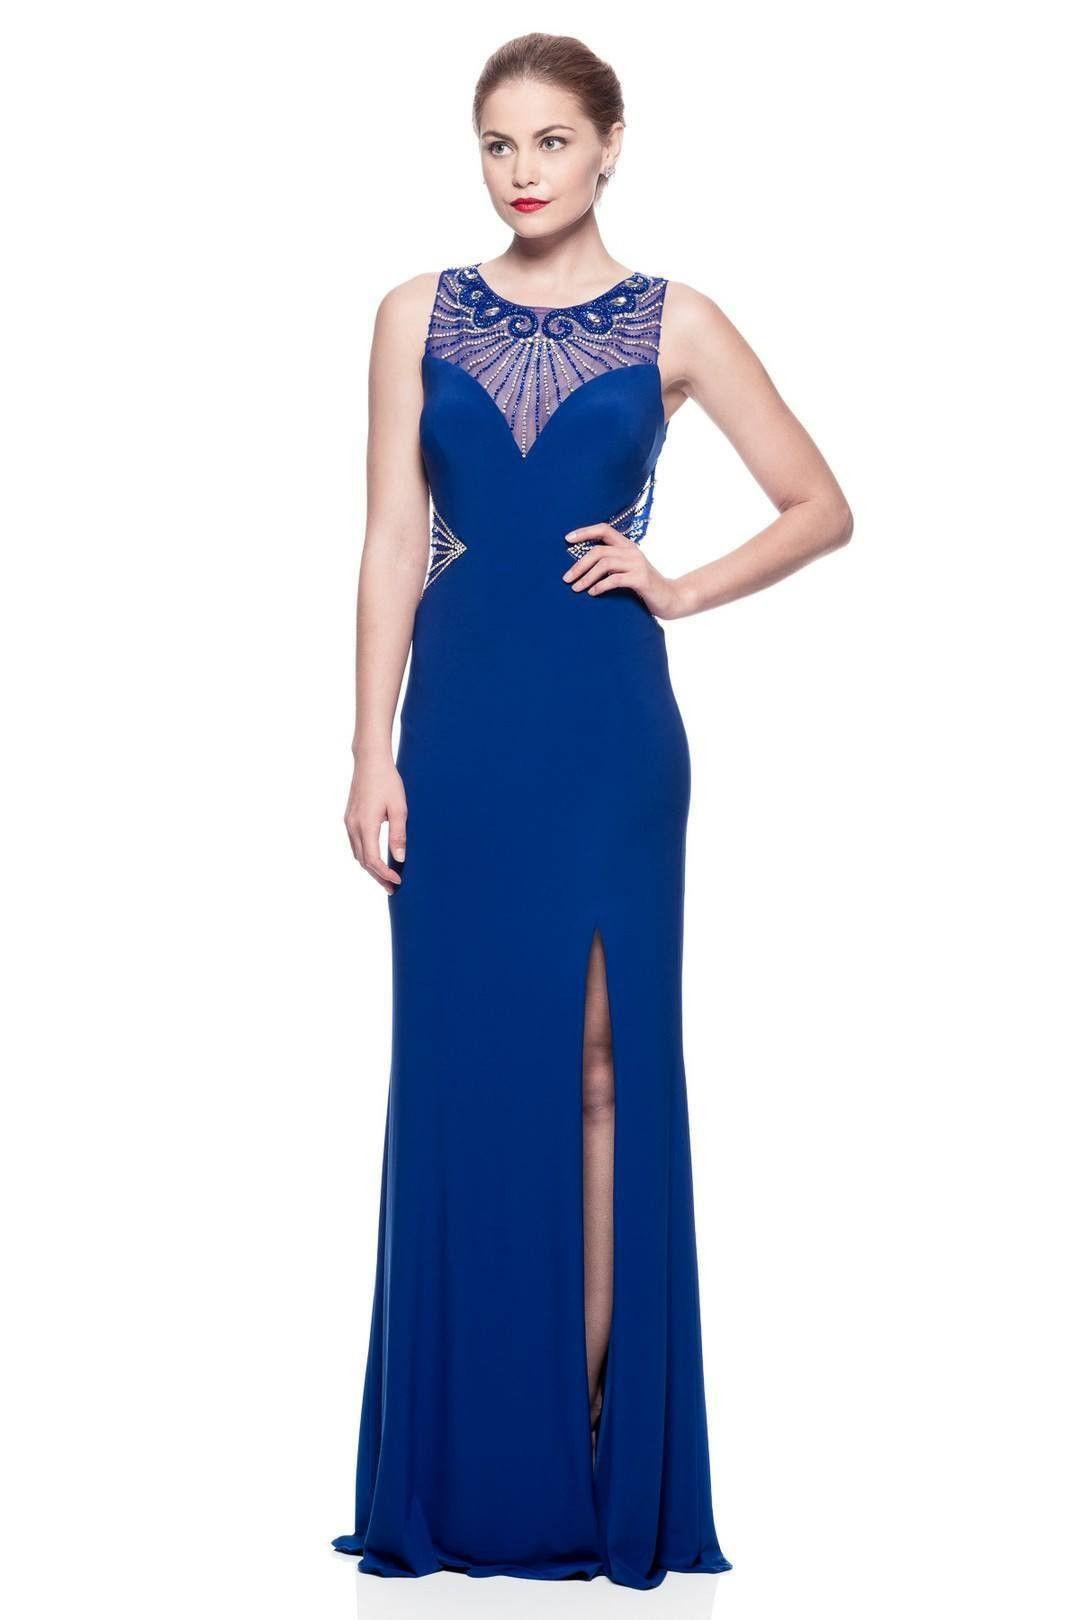 Sexy formal dress Bc#PS15020